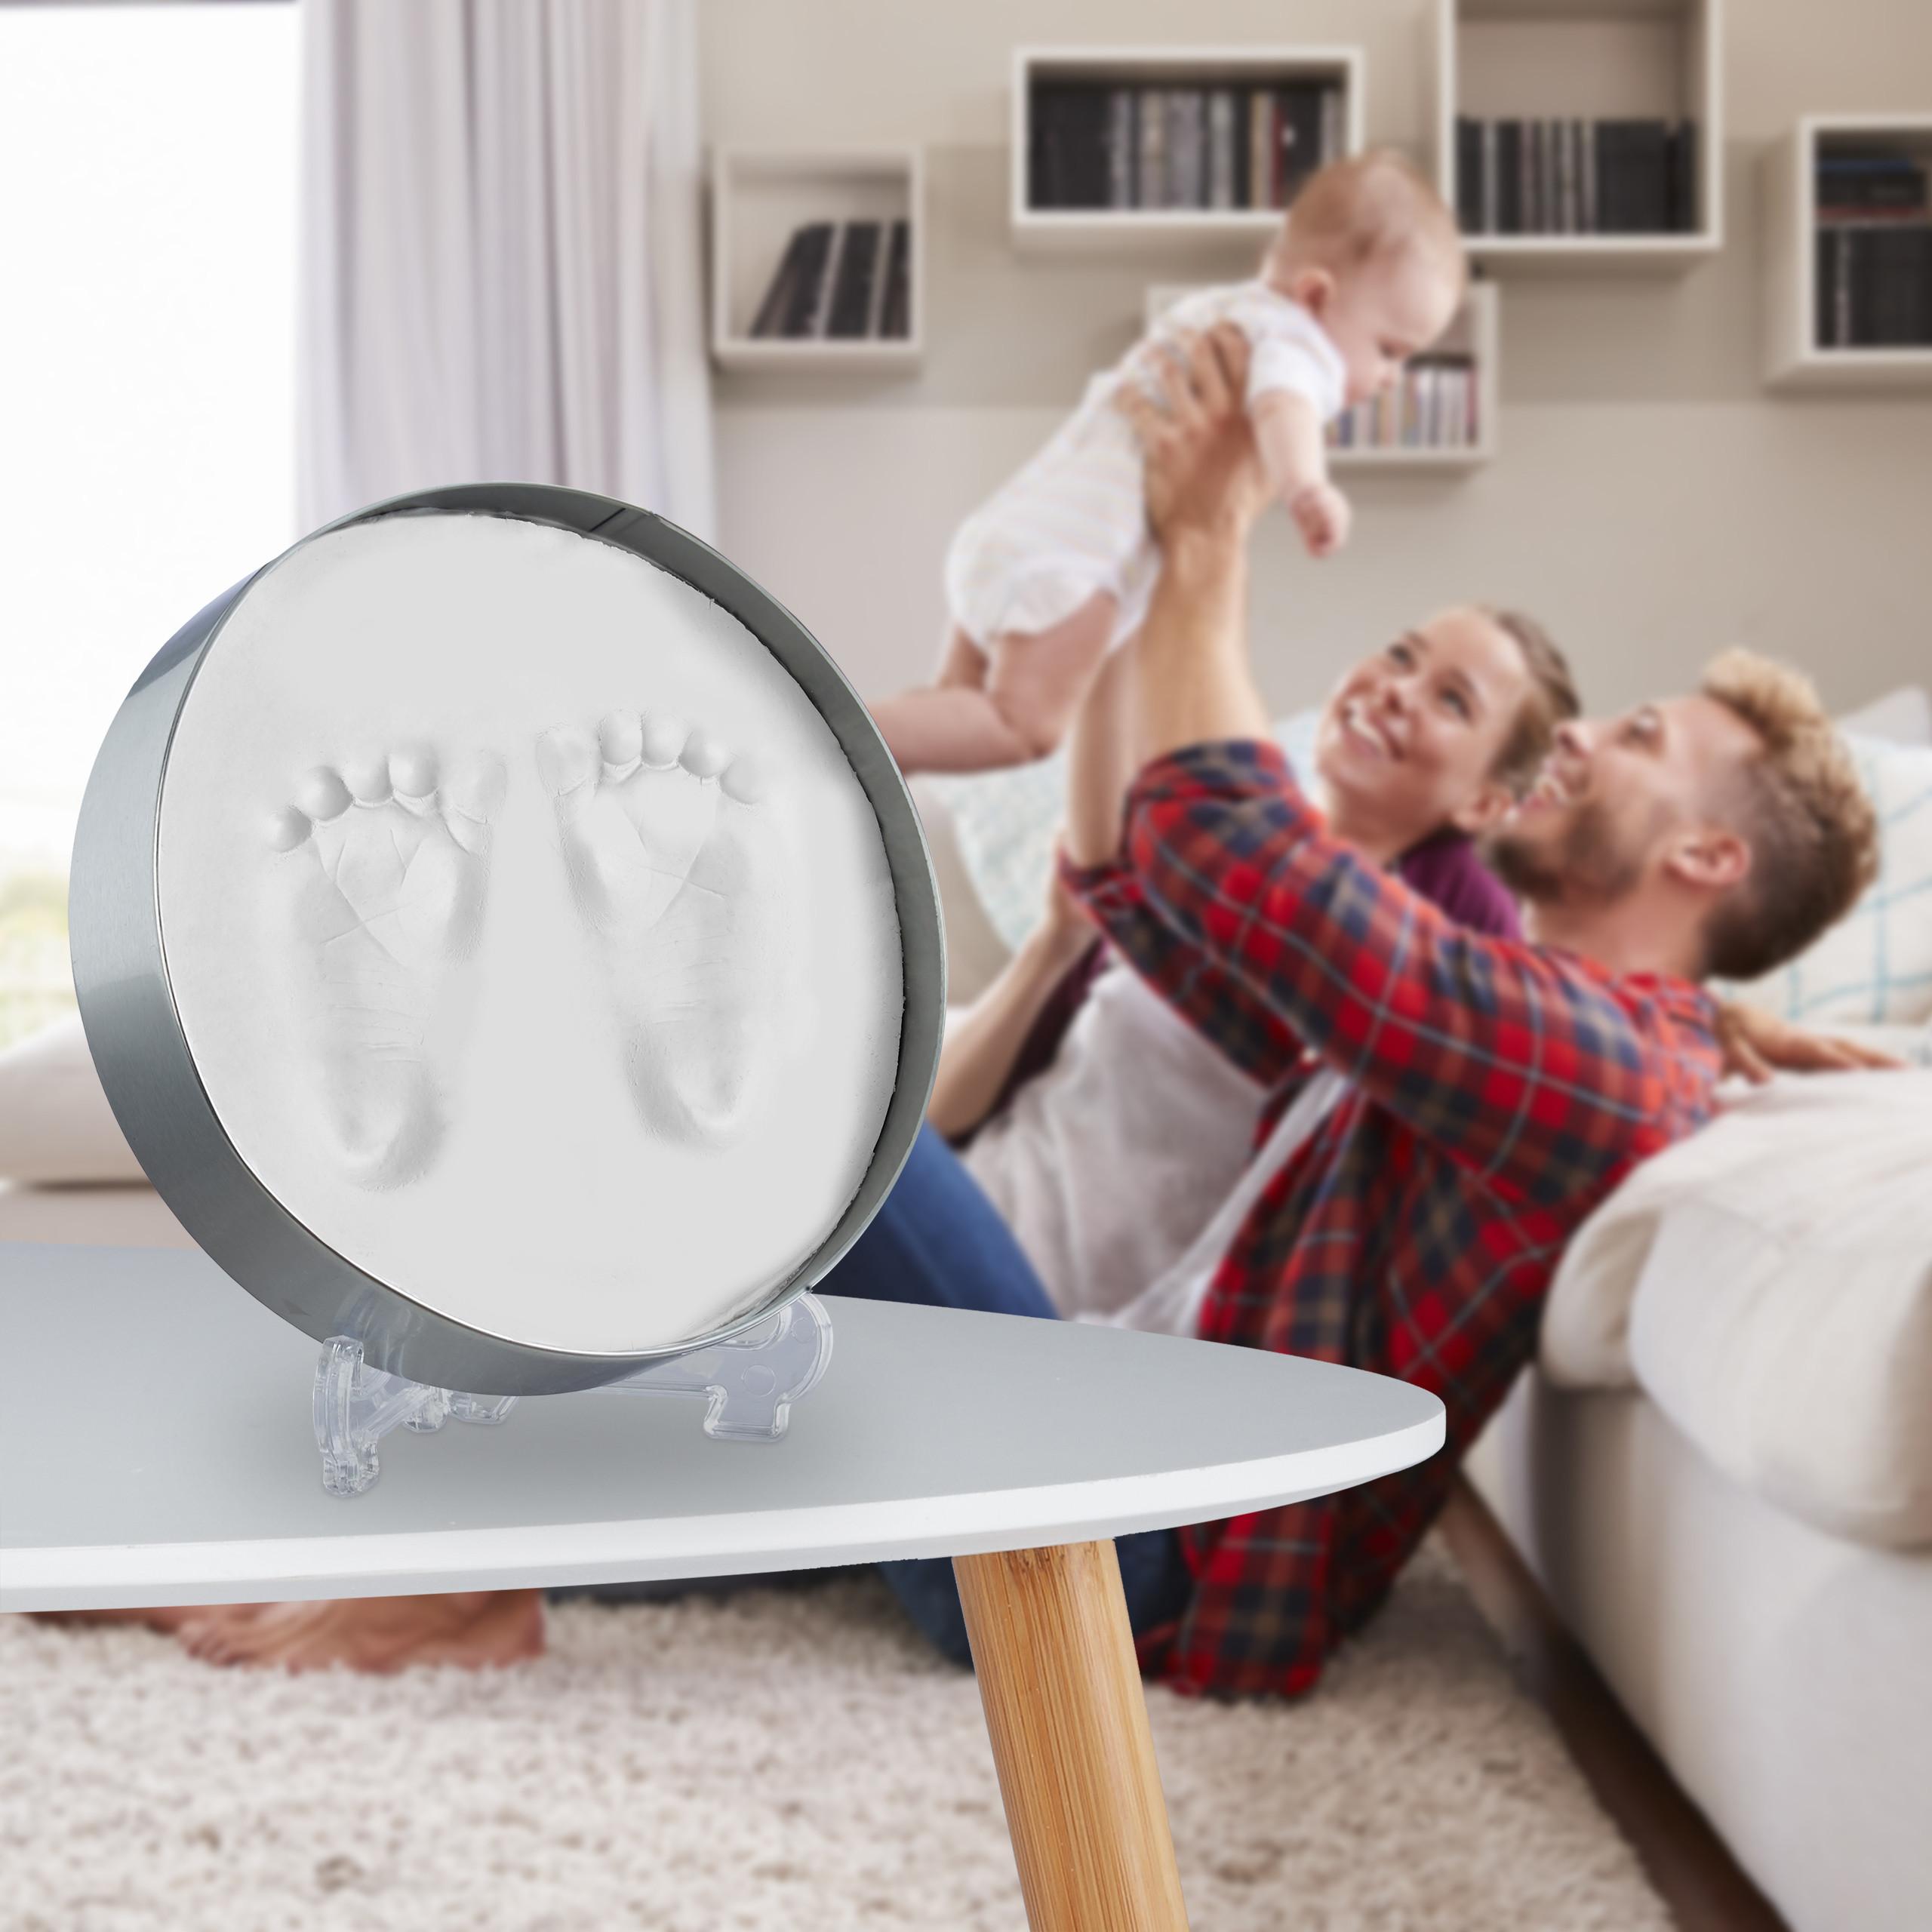 Gipsabdruck-Baby-Gipsabdruckset-Fussabdruck-Handabdruck-Babyabdruck-Set-Gips Indexbild 3